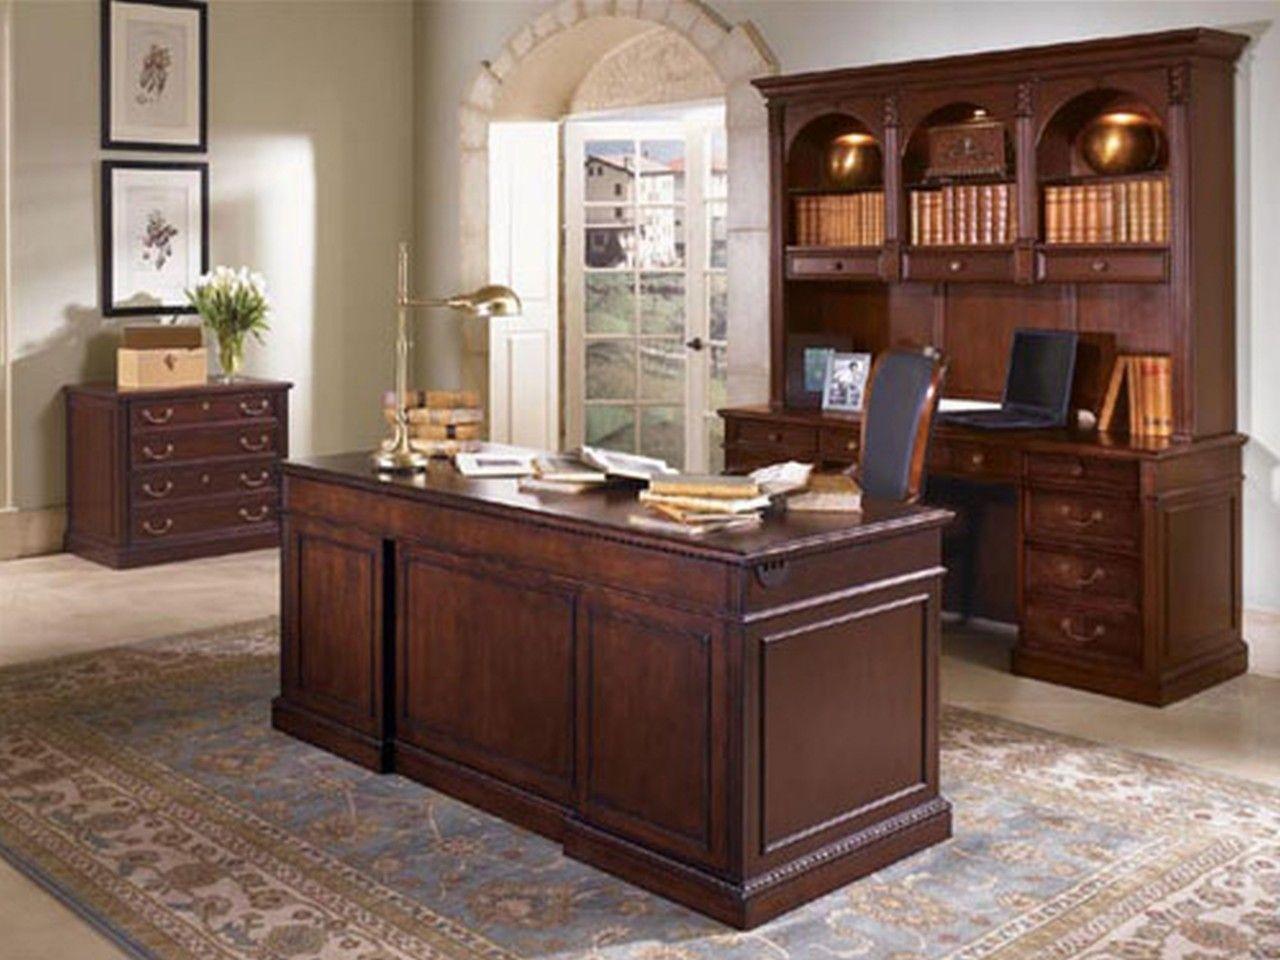 Charming Home Office Furniture Ideas Scheme Heavenly Home Office Setup Splendi Home Office Furniture Design Office Furniture Design Small Home Office Furniture